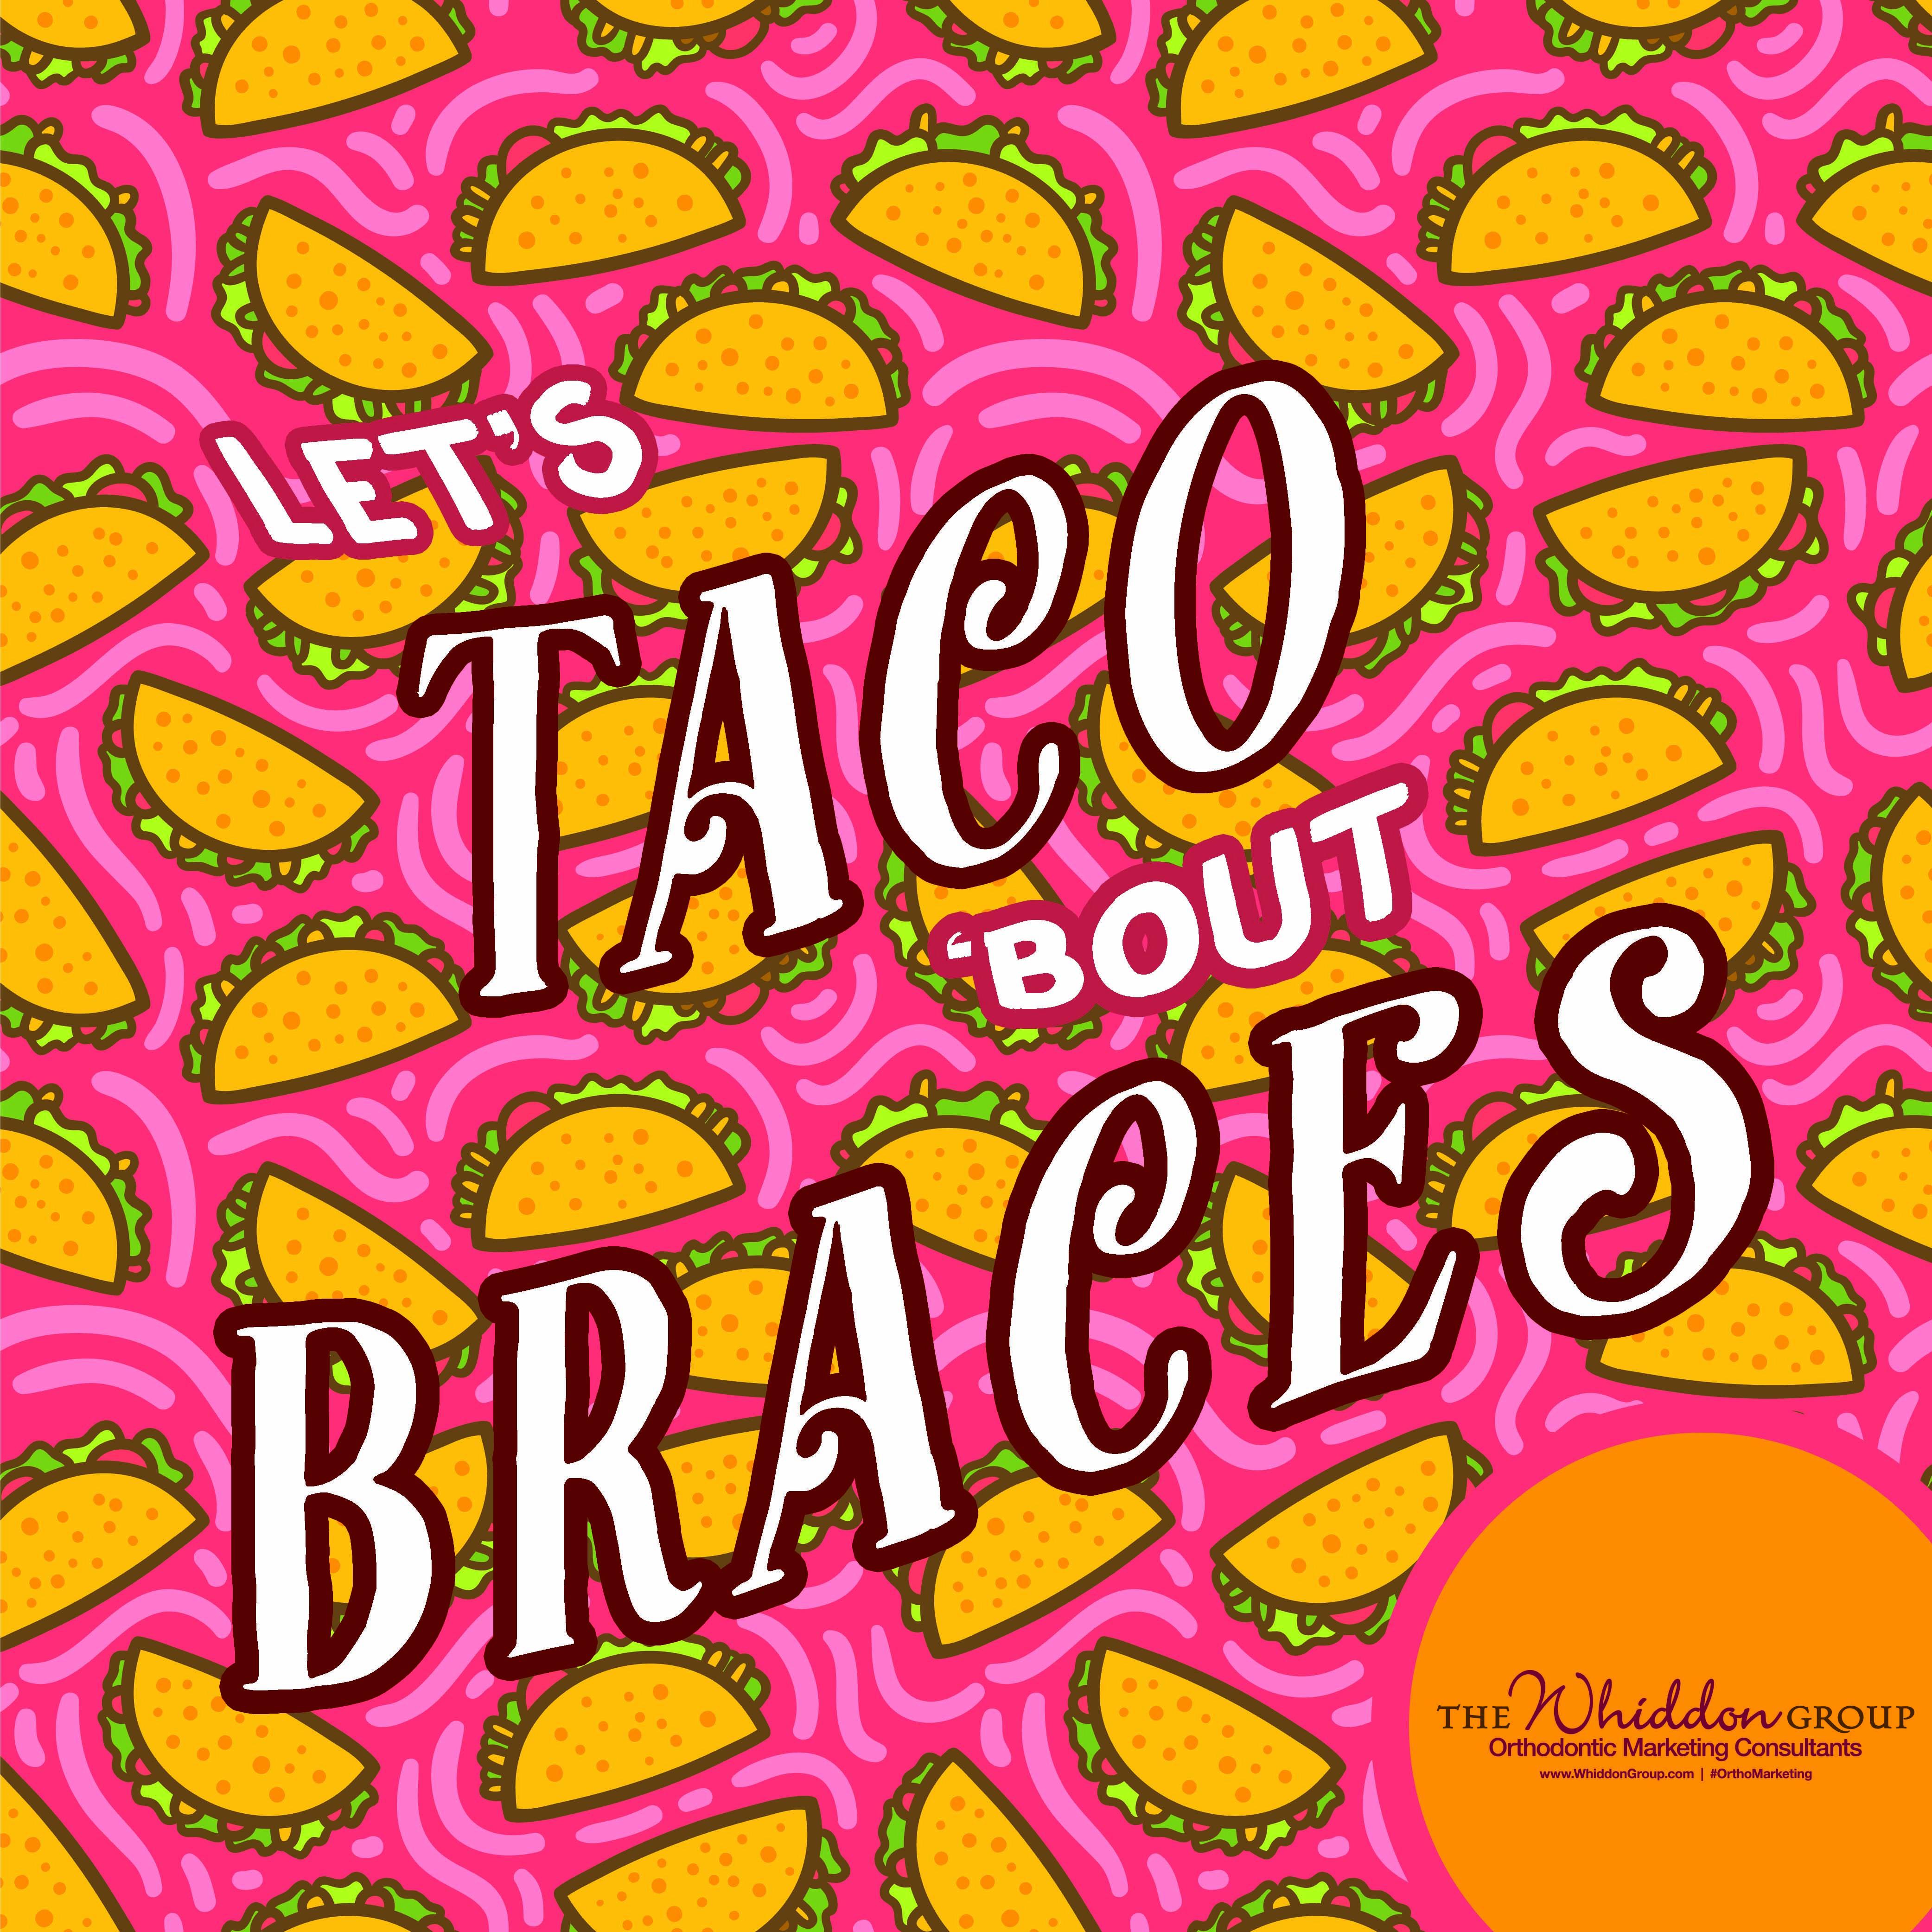 Office ideas for cinco de mayo - Orthodontic Marketing Ideas For Cinco De Mayo Let S Taco Bout Braces